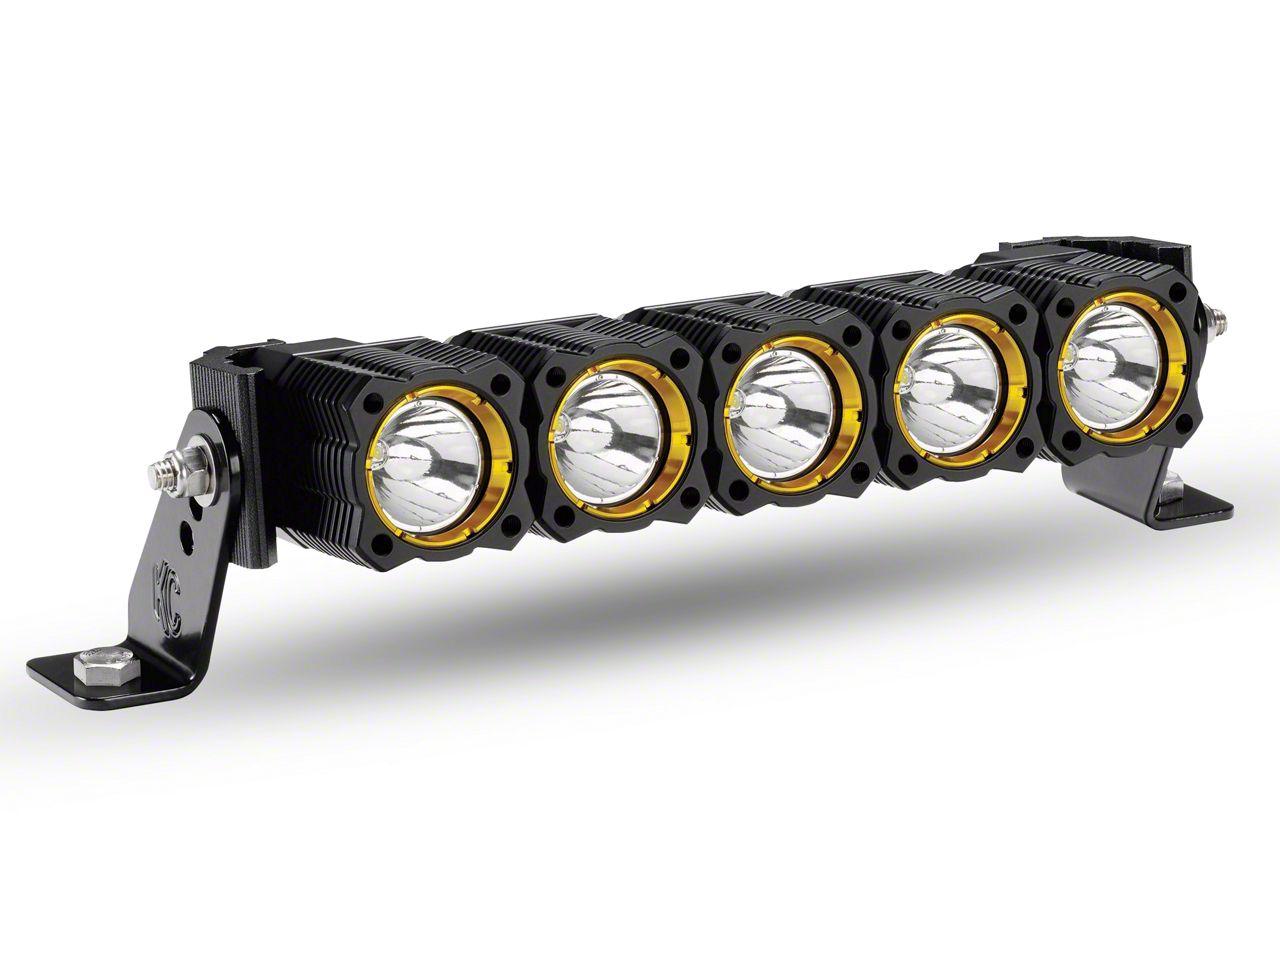 KC HiLiTES 50 in. Flex Array LED Light Bar - Combo Beam